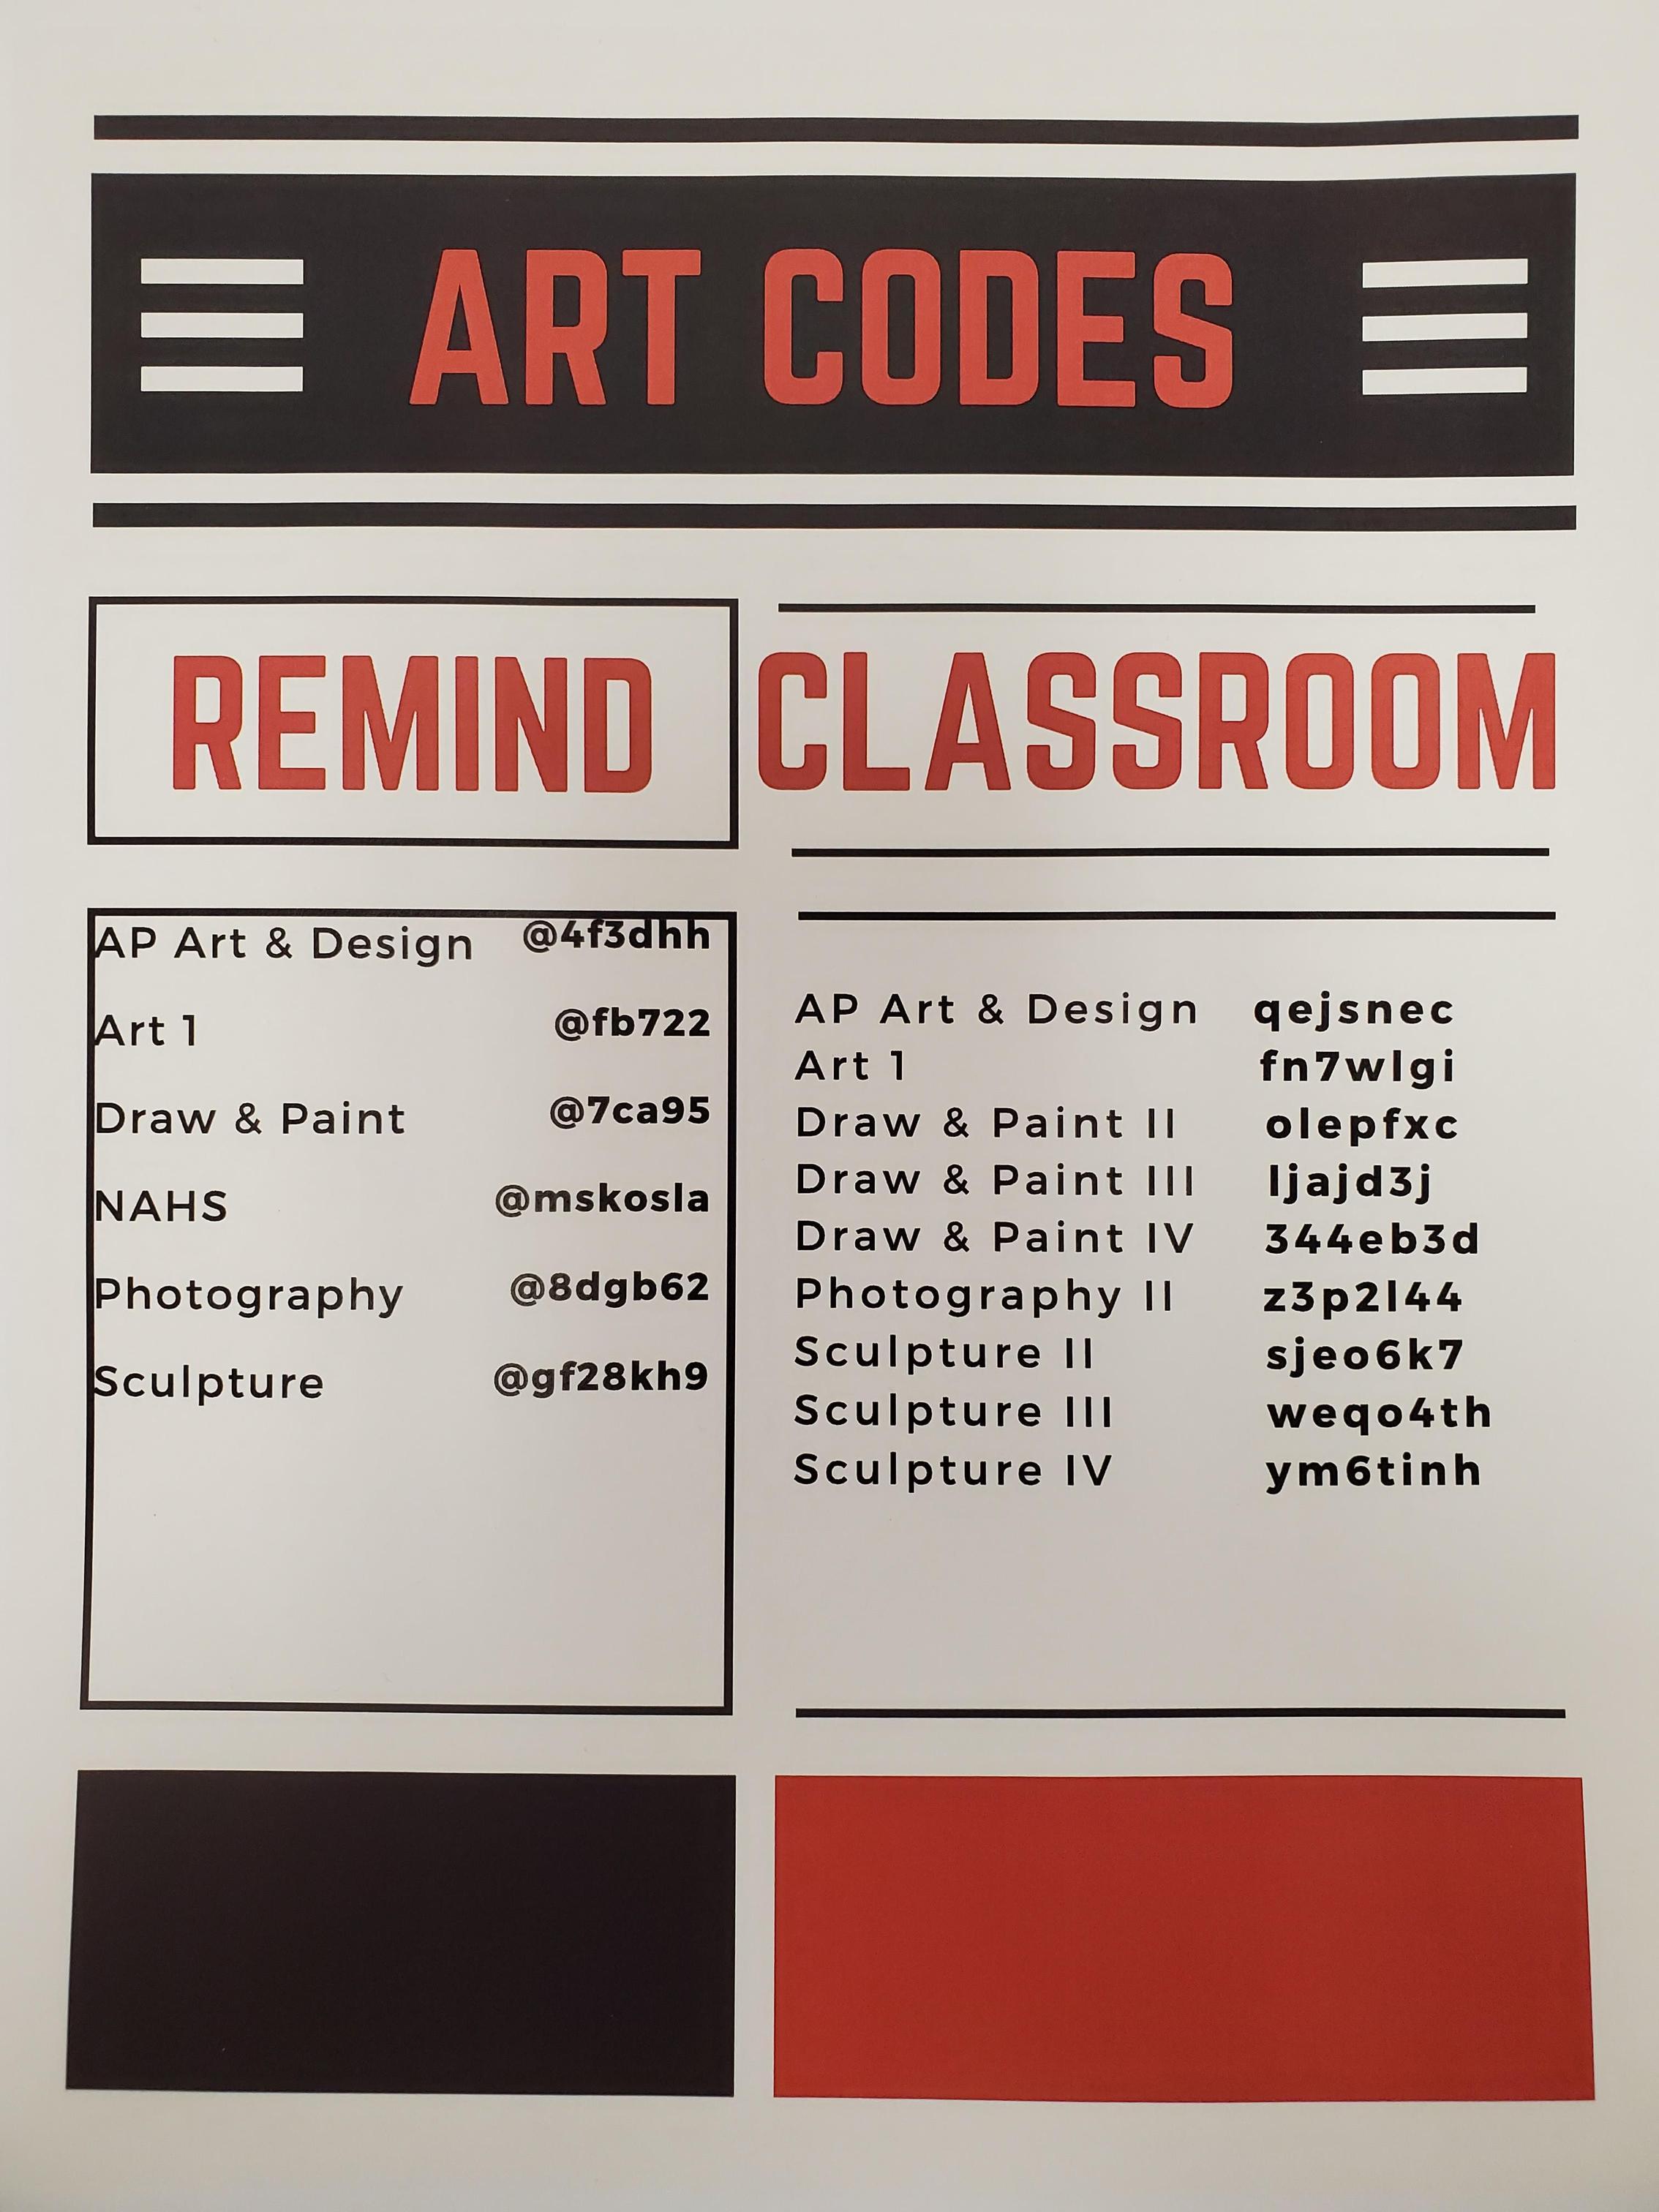 Art Codes 2020